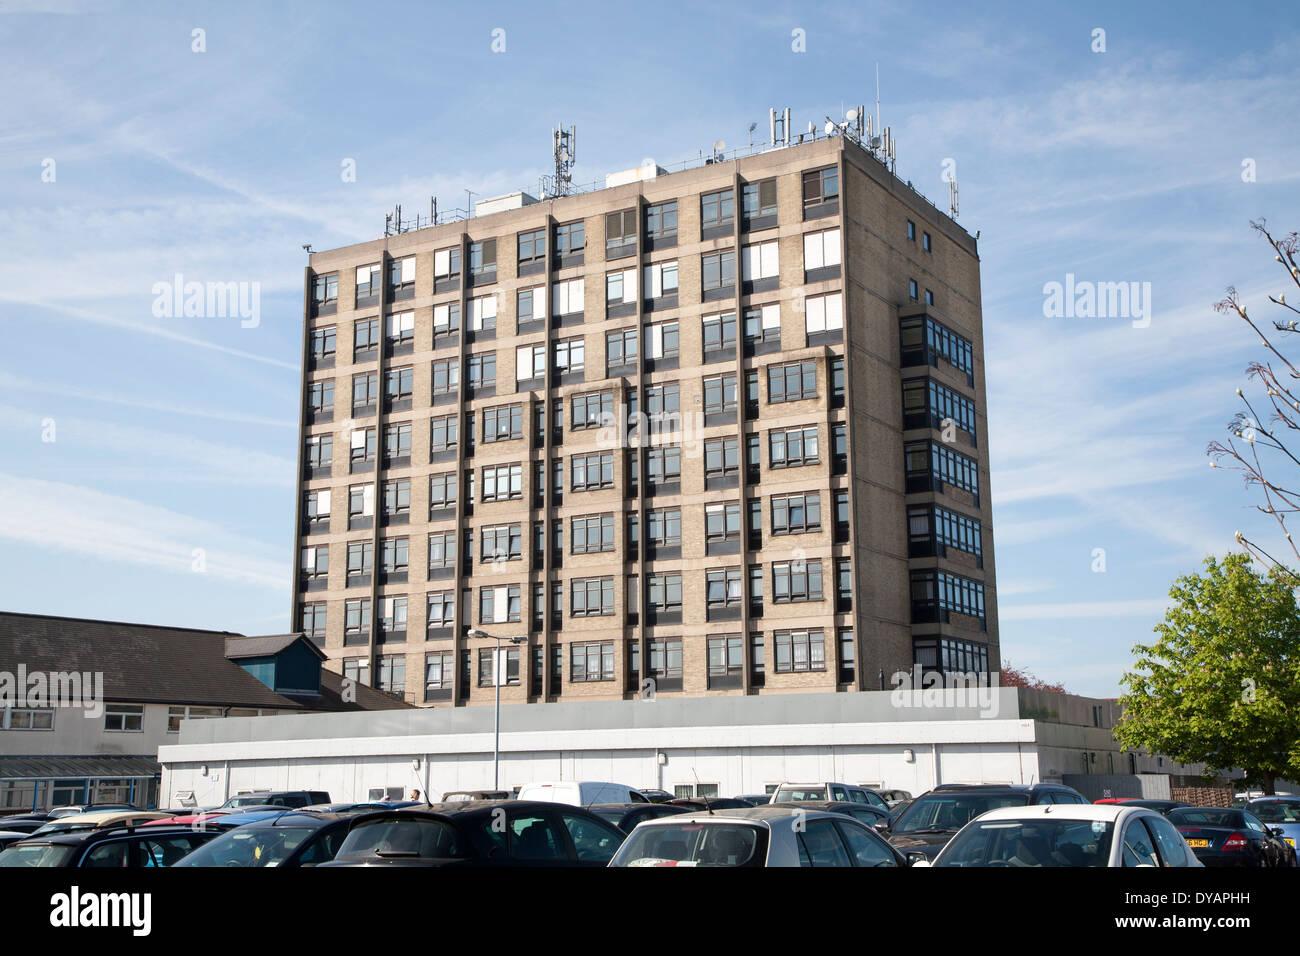 Unité de maternité à l'Hôpital d'Ipswich, NHS Trust, Ipswich, Suffolk, Angleterre Photo Stock